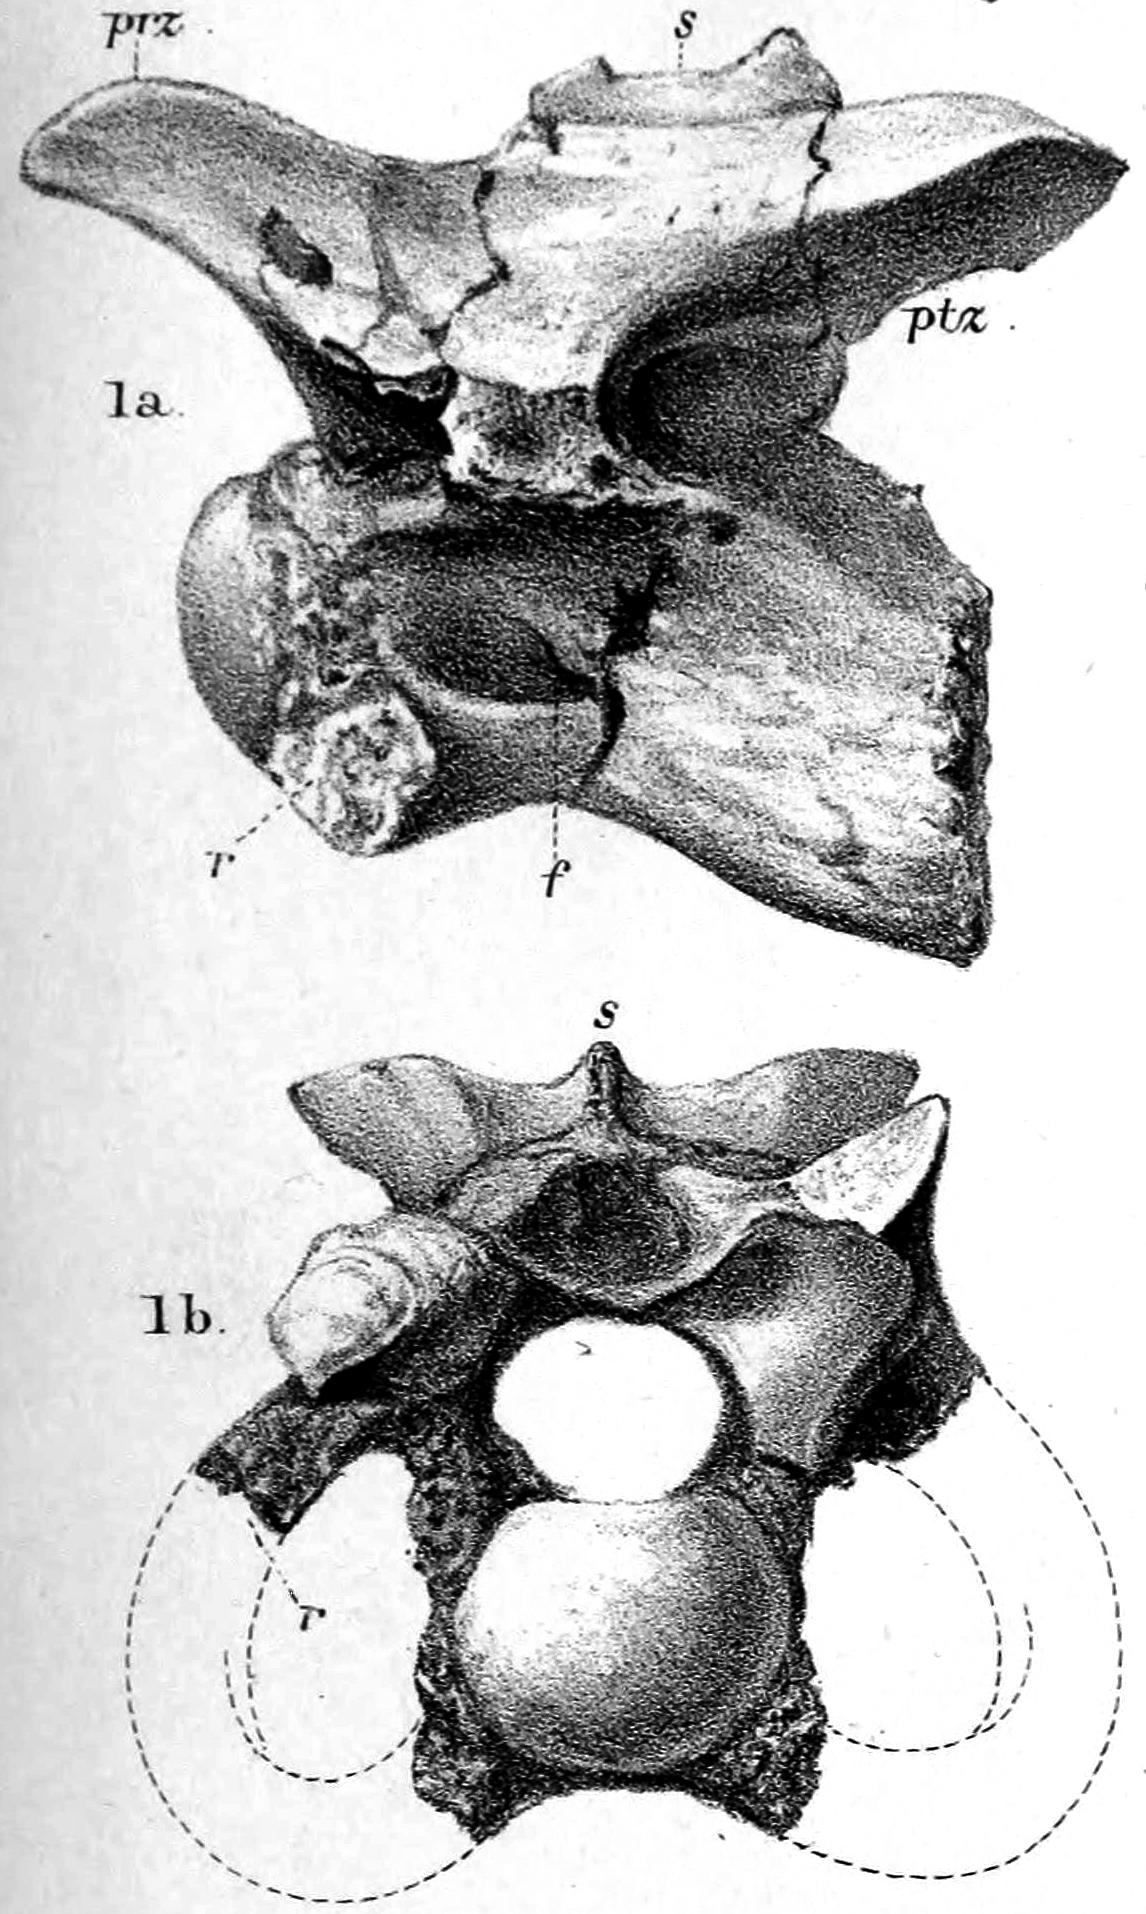 Calamosaurus.jpg